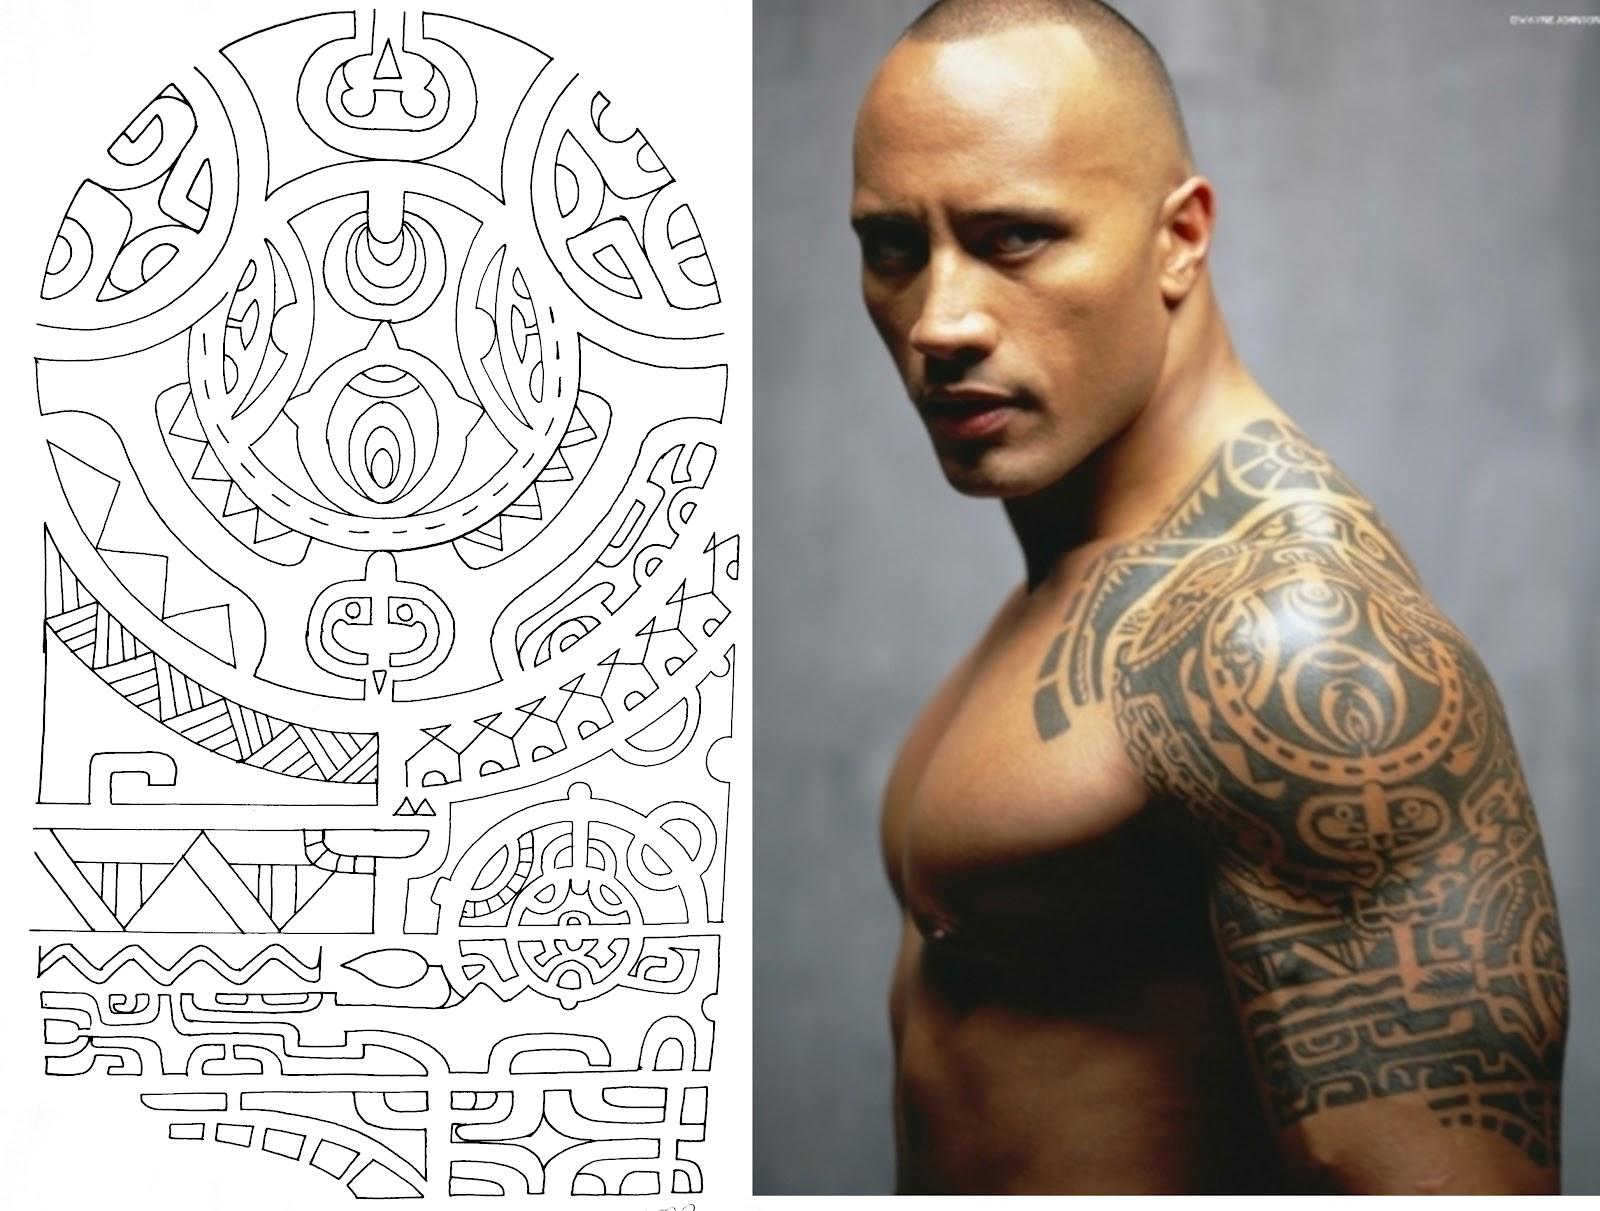 Tattoo ideas names on chest maria teresa marymendoza on pinterest